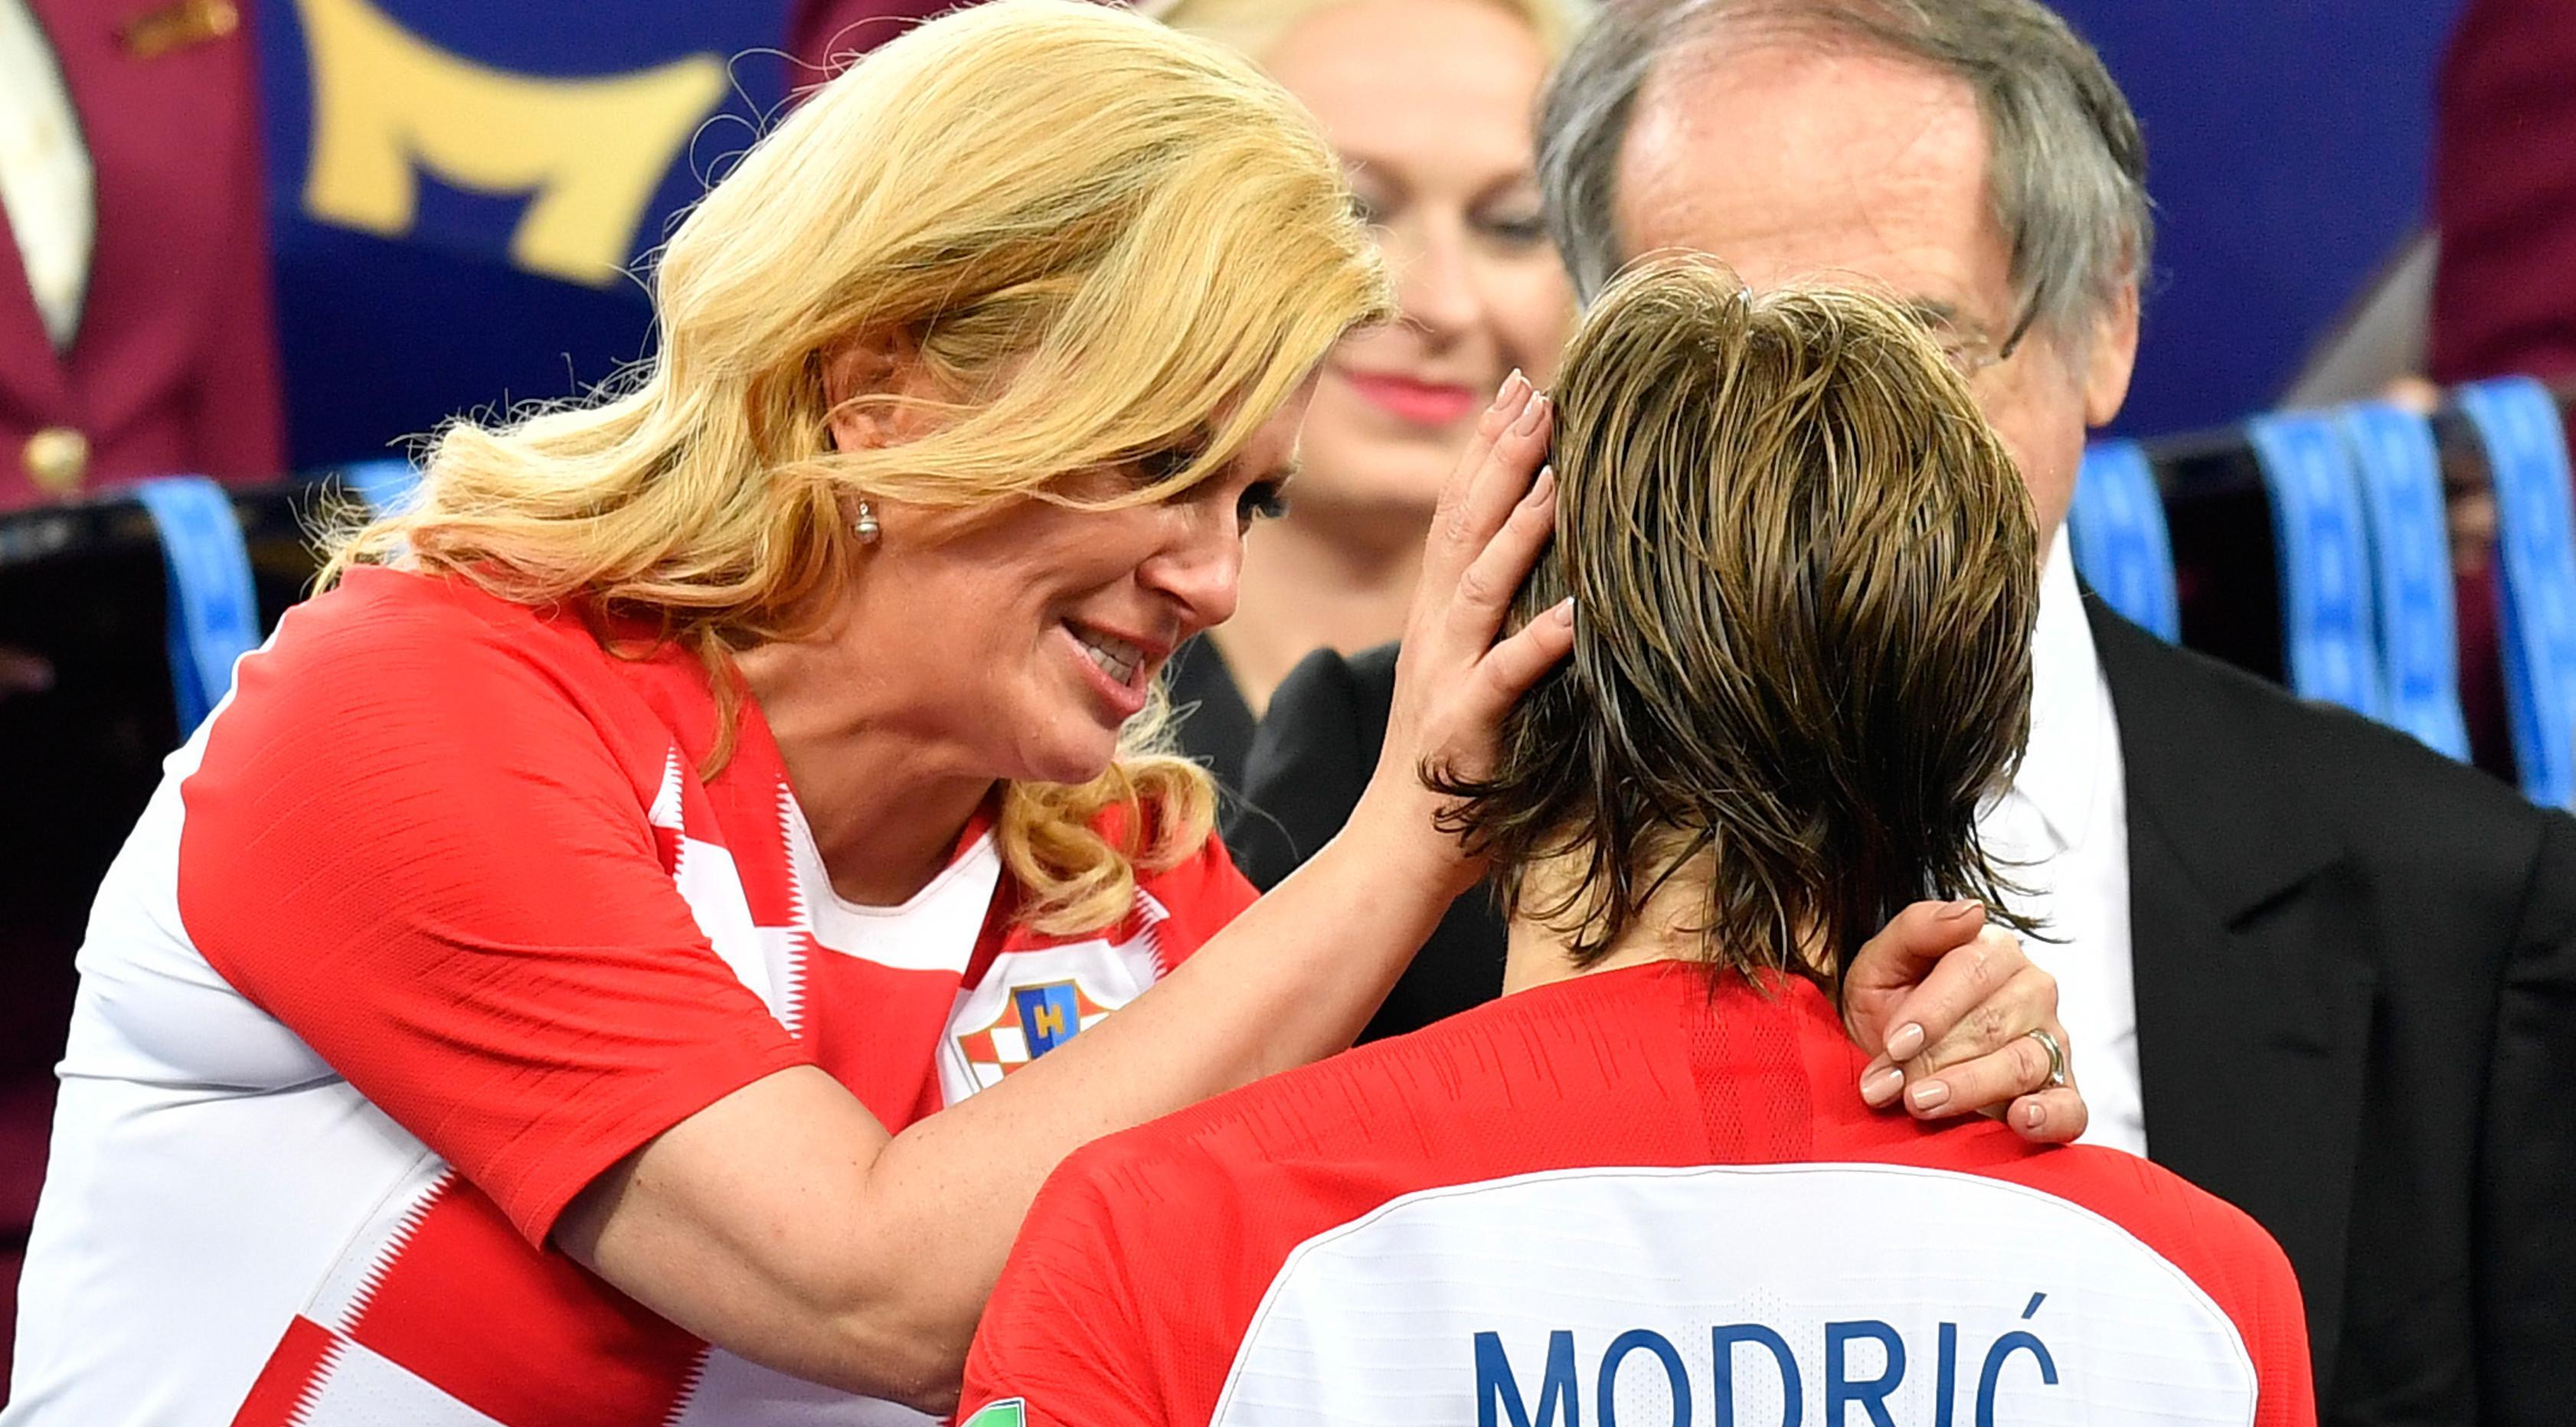 Presiden Kroasia, Kolinda Grabar-Kitarovic memeluk Kapten timnas Kroasia, Luka Modric pada akhir laga final Piala Dunia 2018 di Luzhniki Stadium, Minggu (15/7). Kroasia harus puas menjadi runner-up seusai kalah 2-4 melawan Prancis. (AP/Martin Meissner)